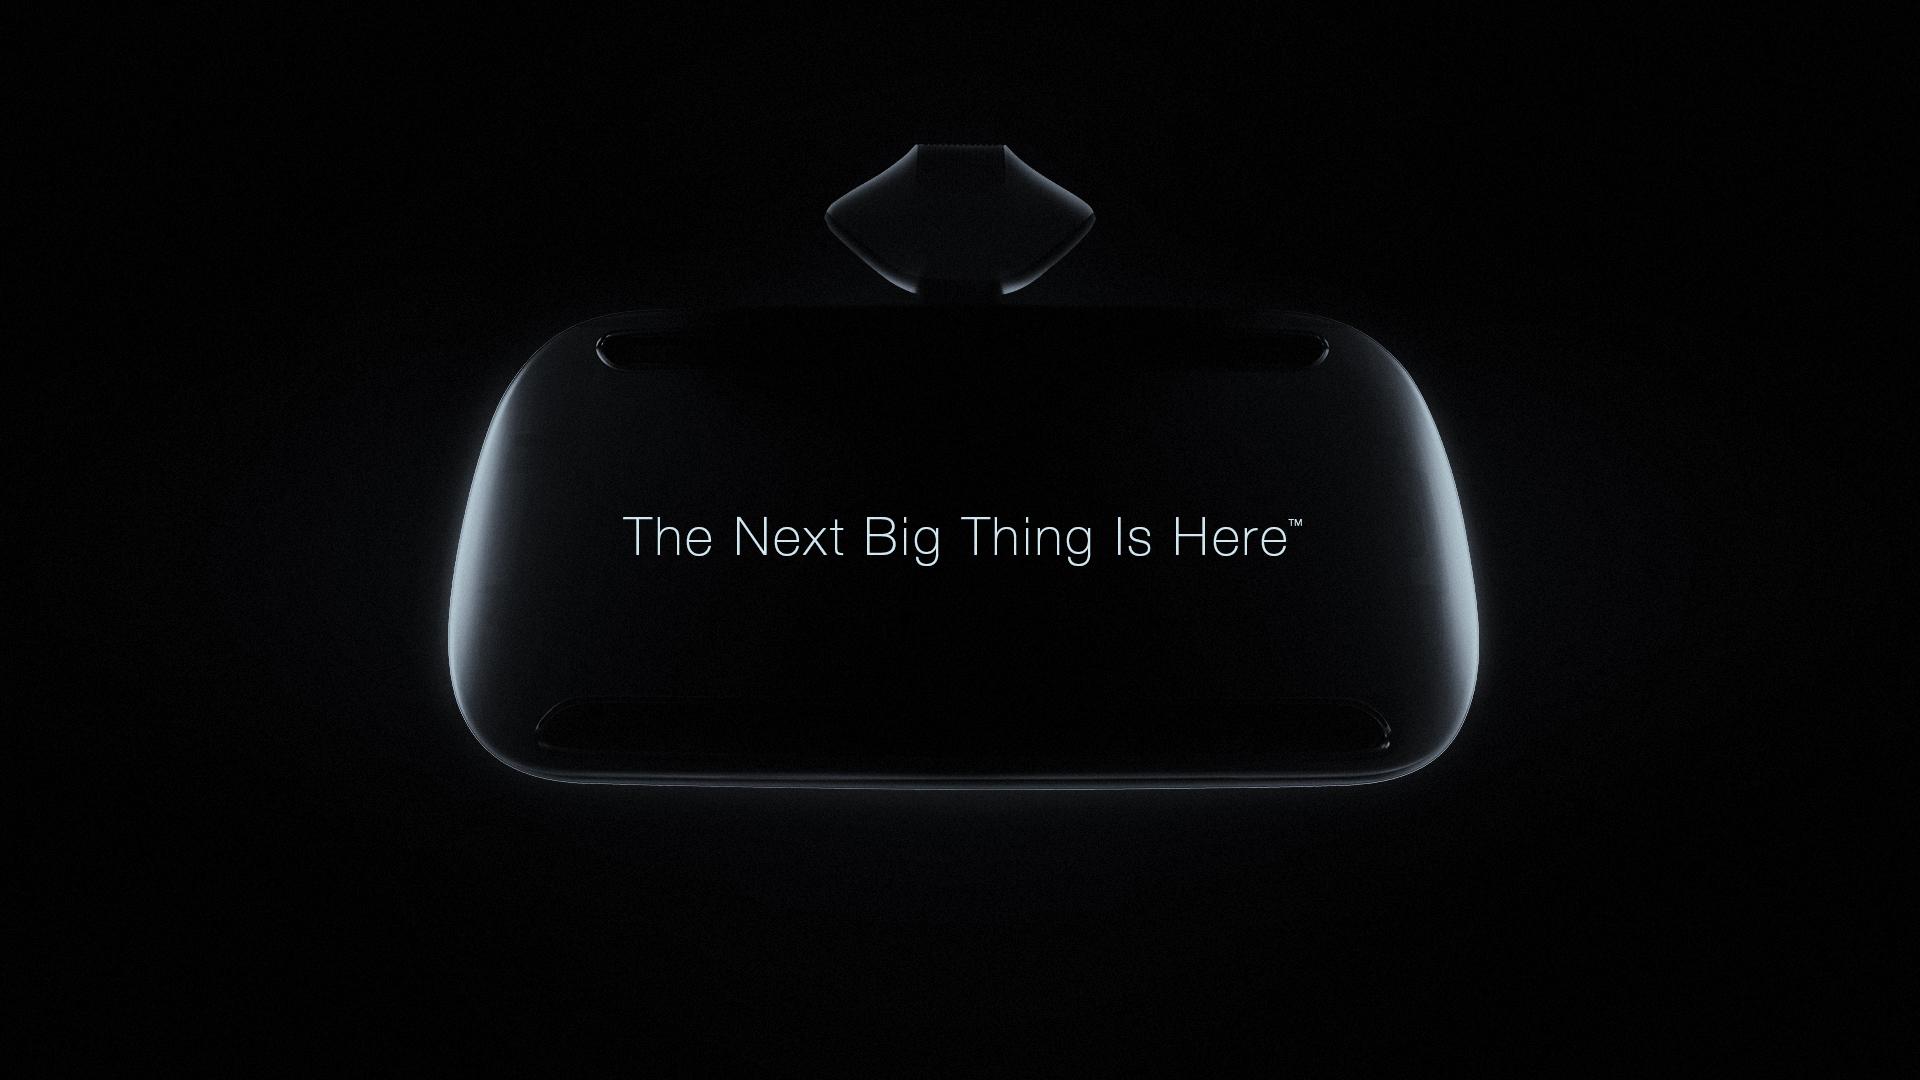 Samsung_VR_Tagline.jpg